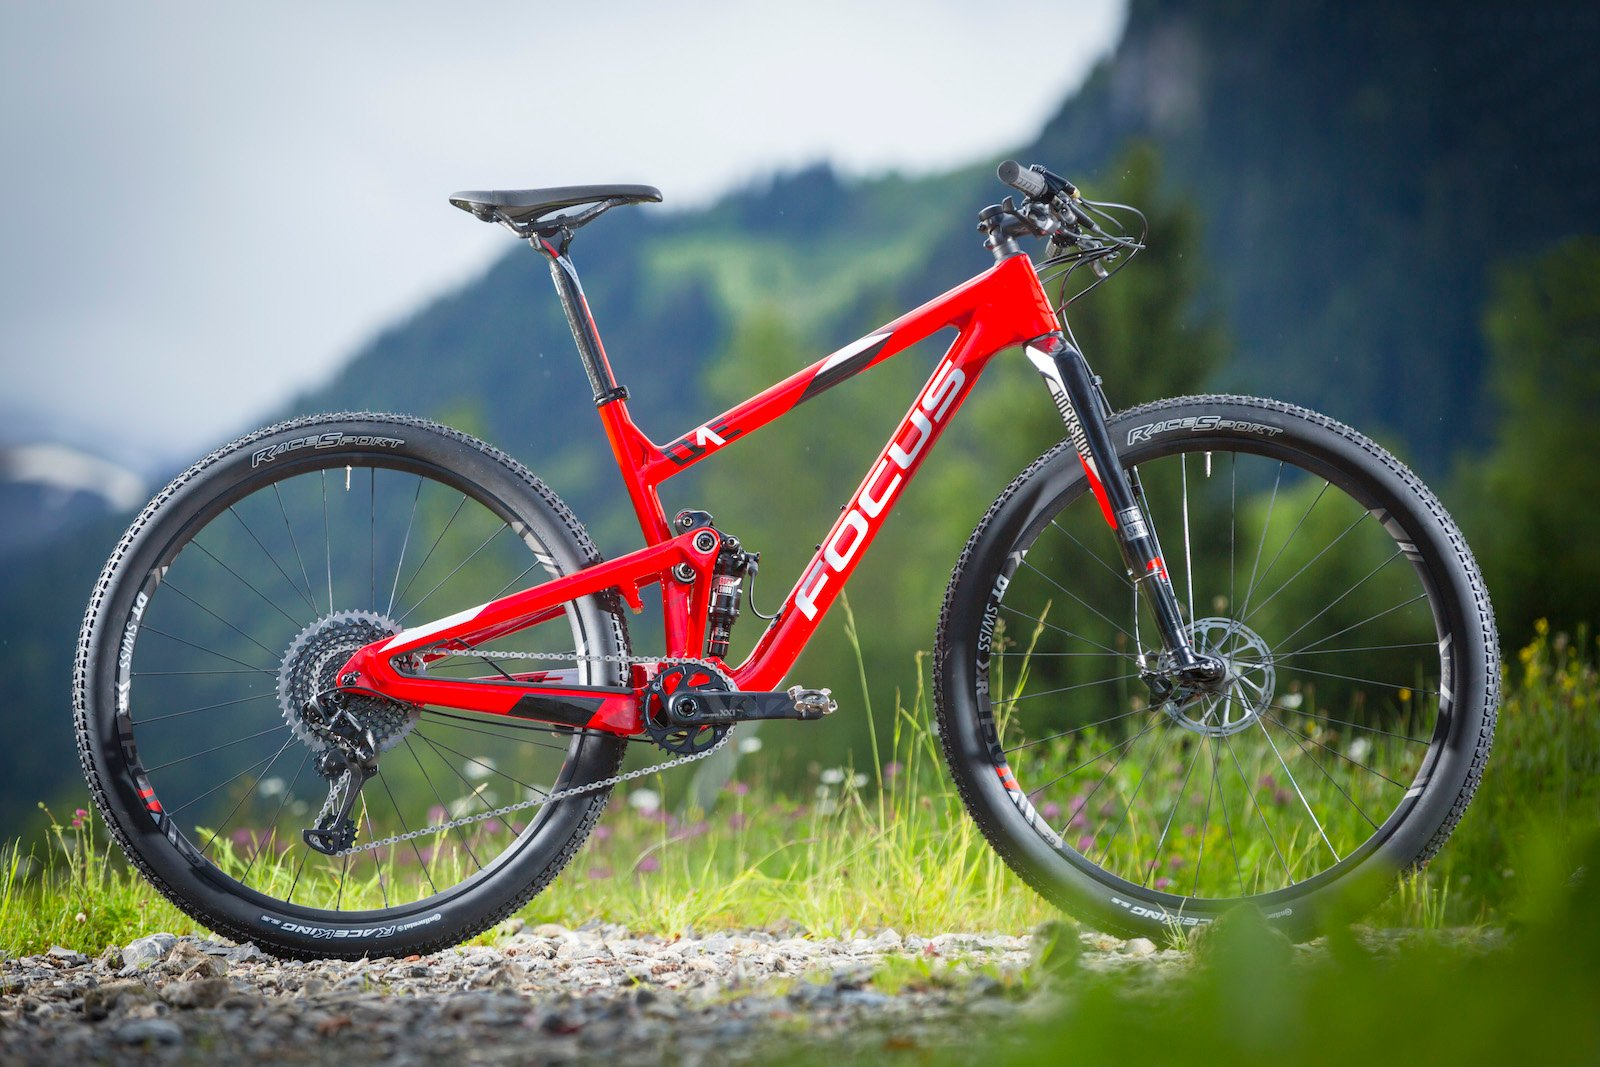 GD255803_Focus Morzine 2016 Bikes_One